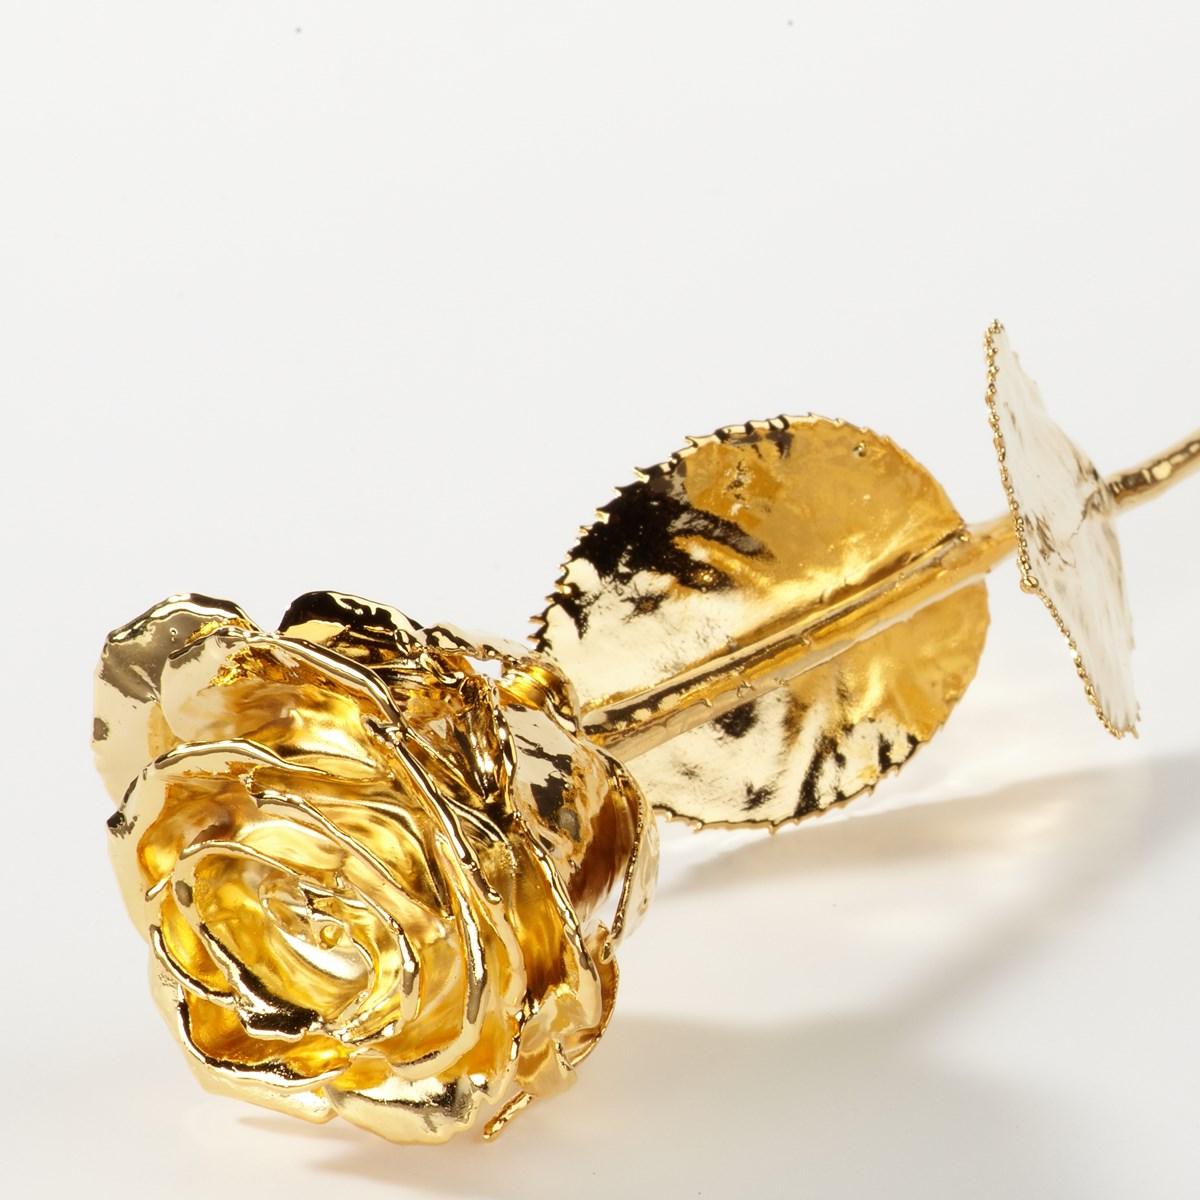 Rosa d'oro